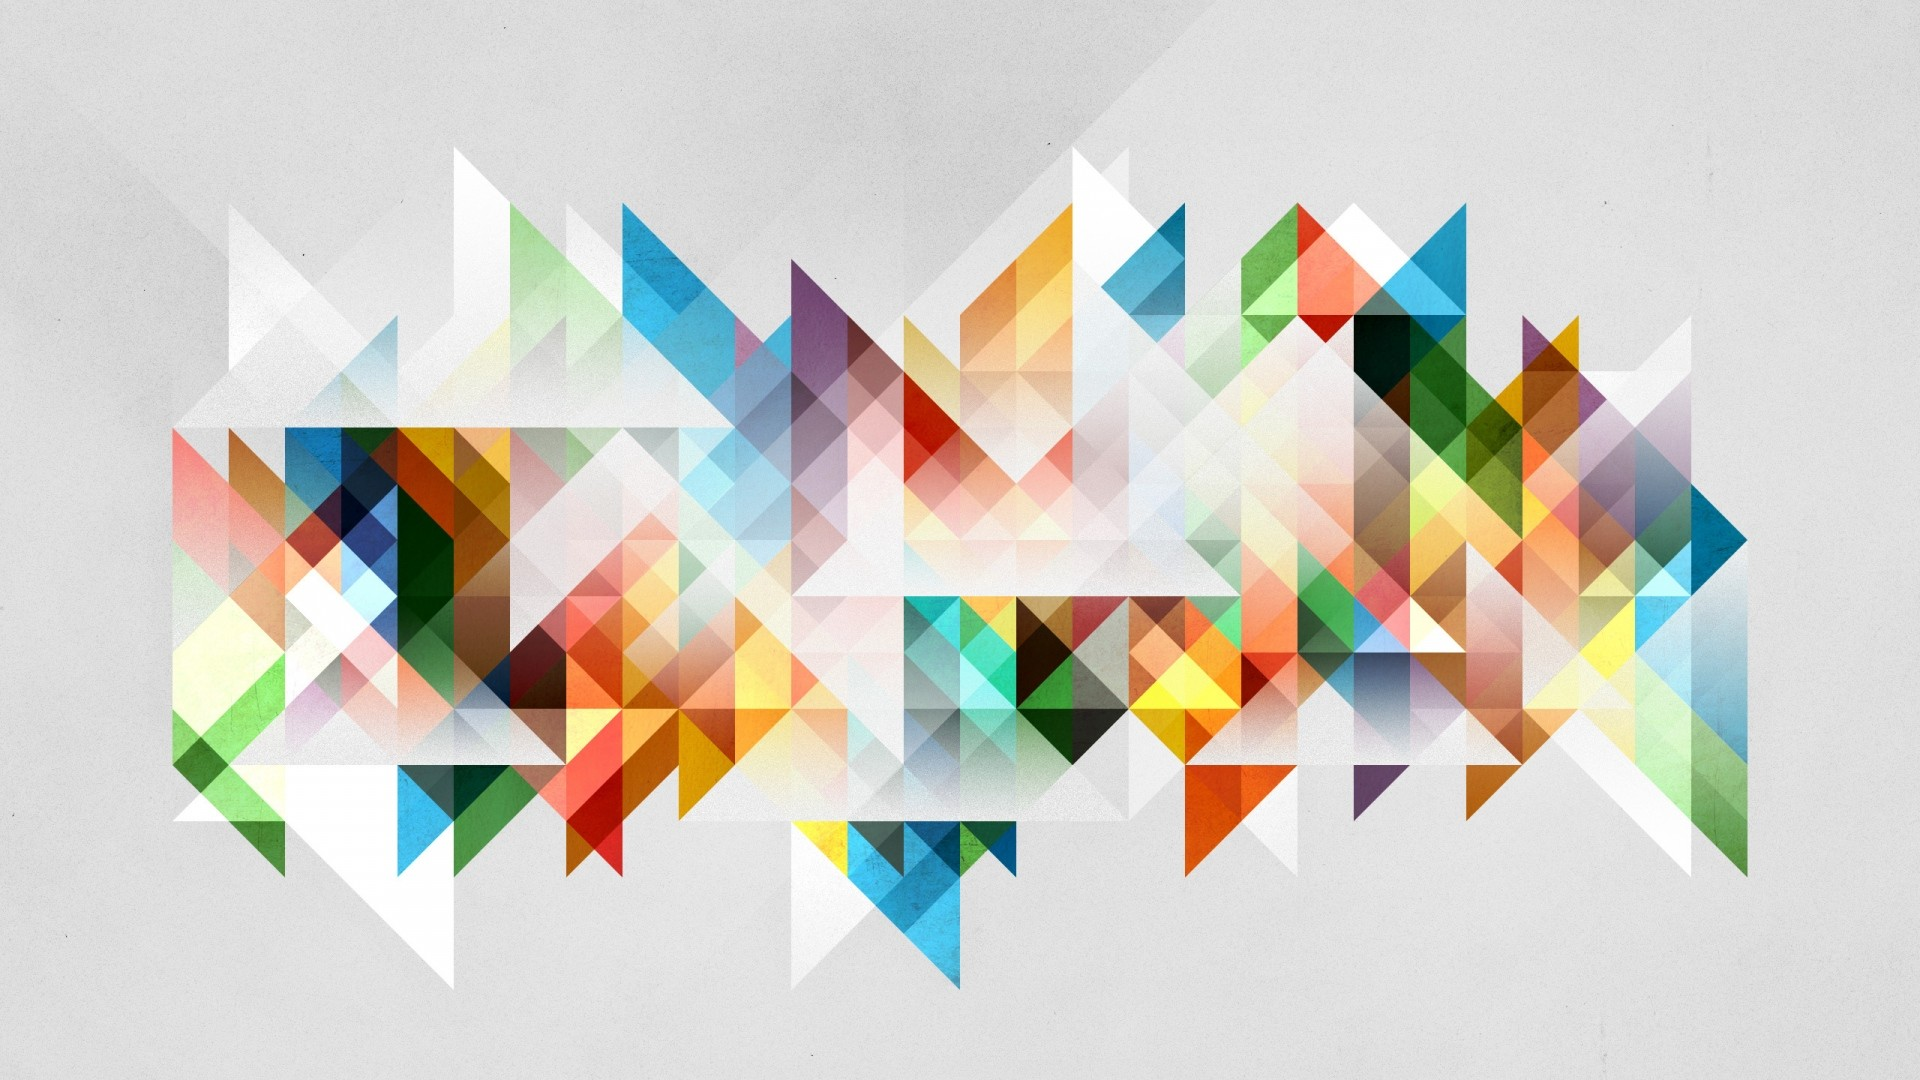 desktop wallpaper abstract (72+ images)